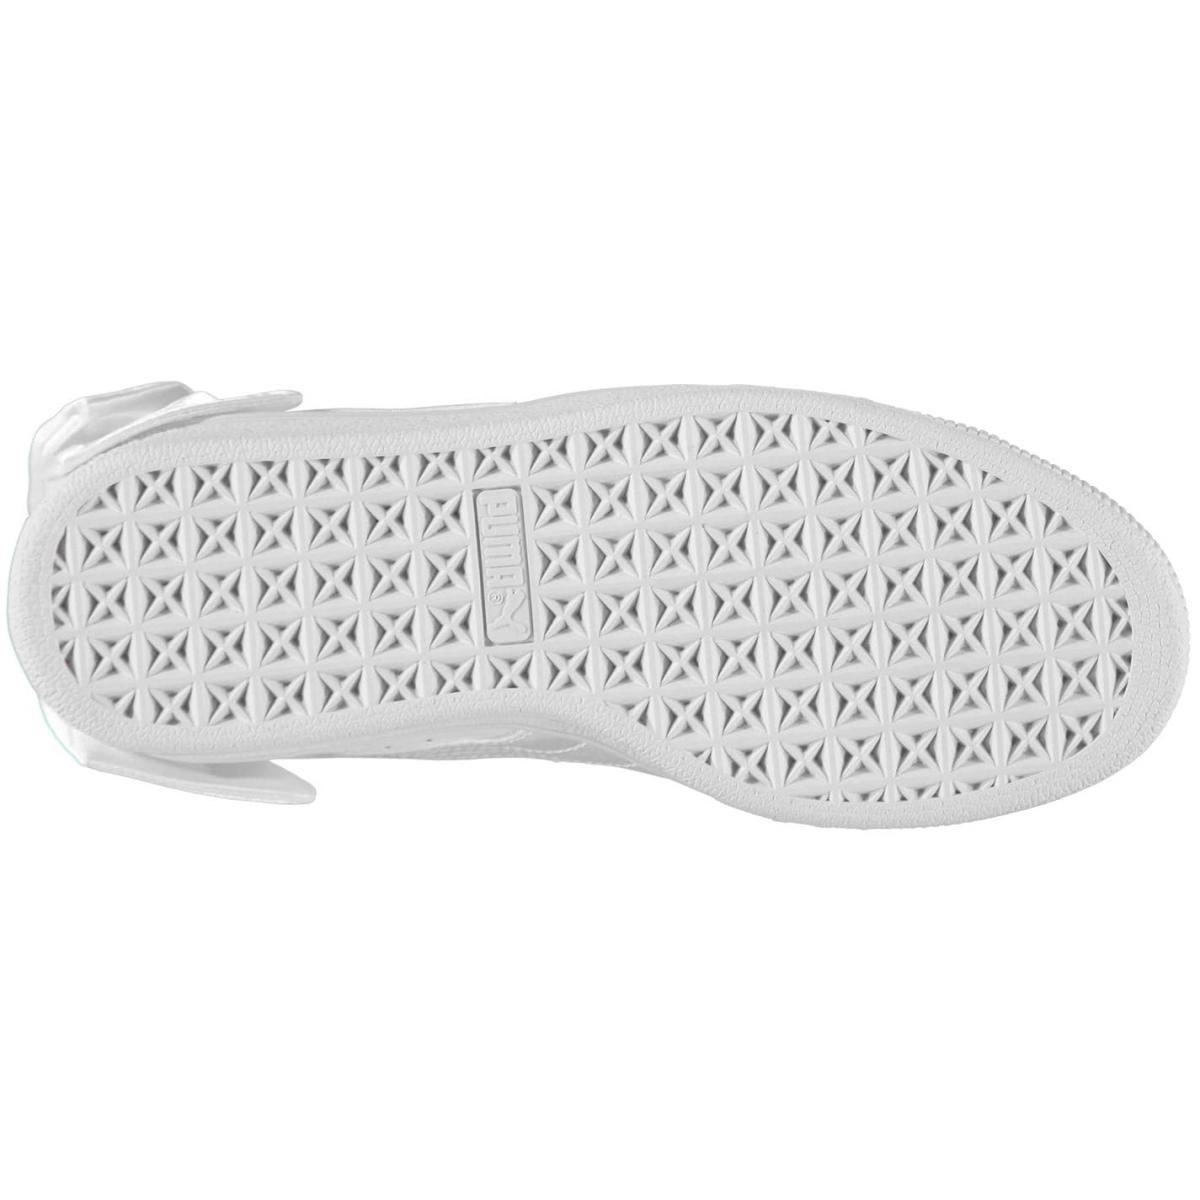 Puma-Basket-Turnschuhe-Damen-Sneaker-Sportschuhe-Laufschuhe-9061 Indexbild 6